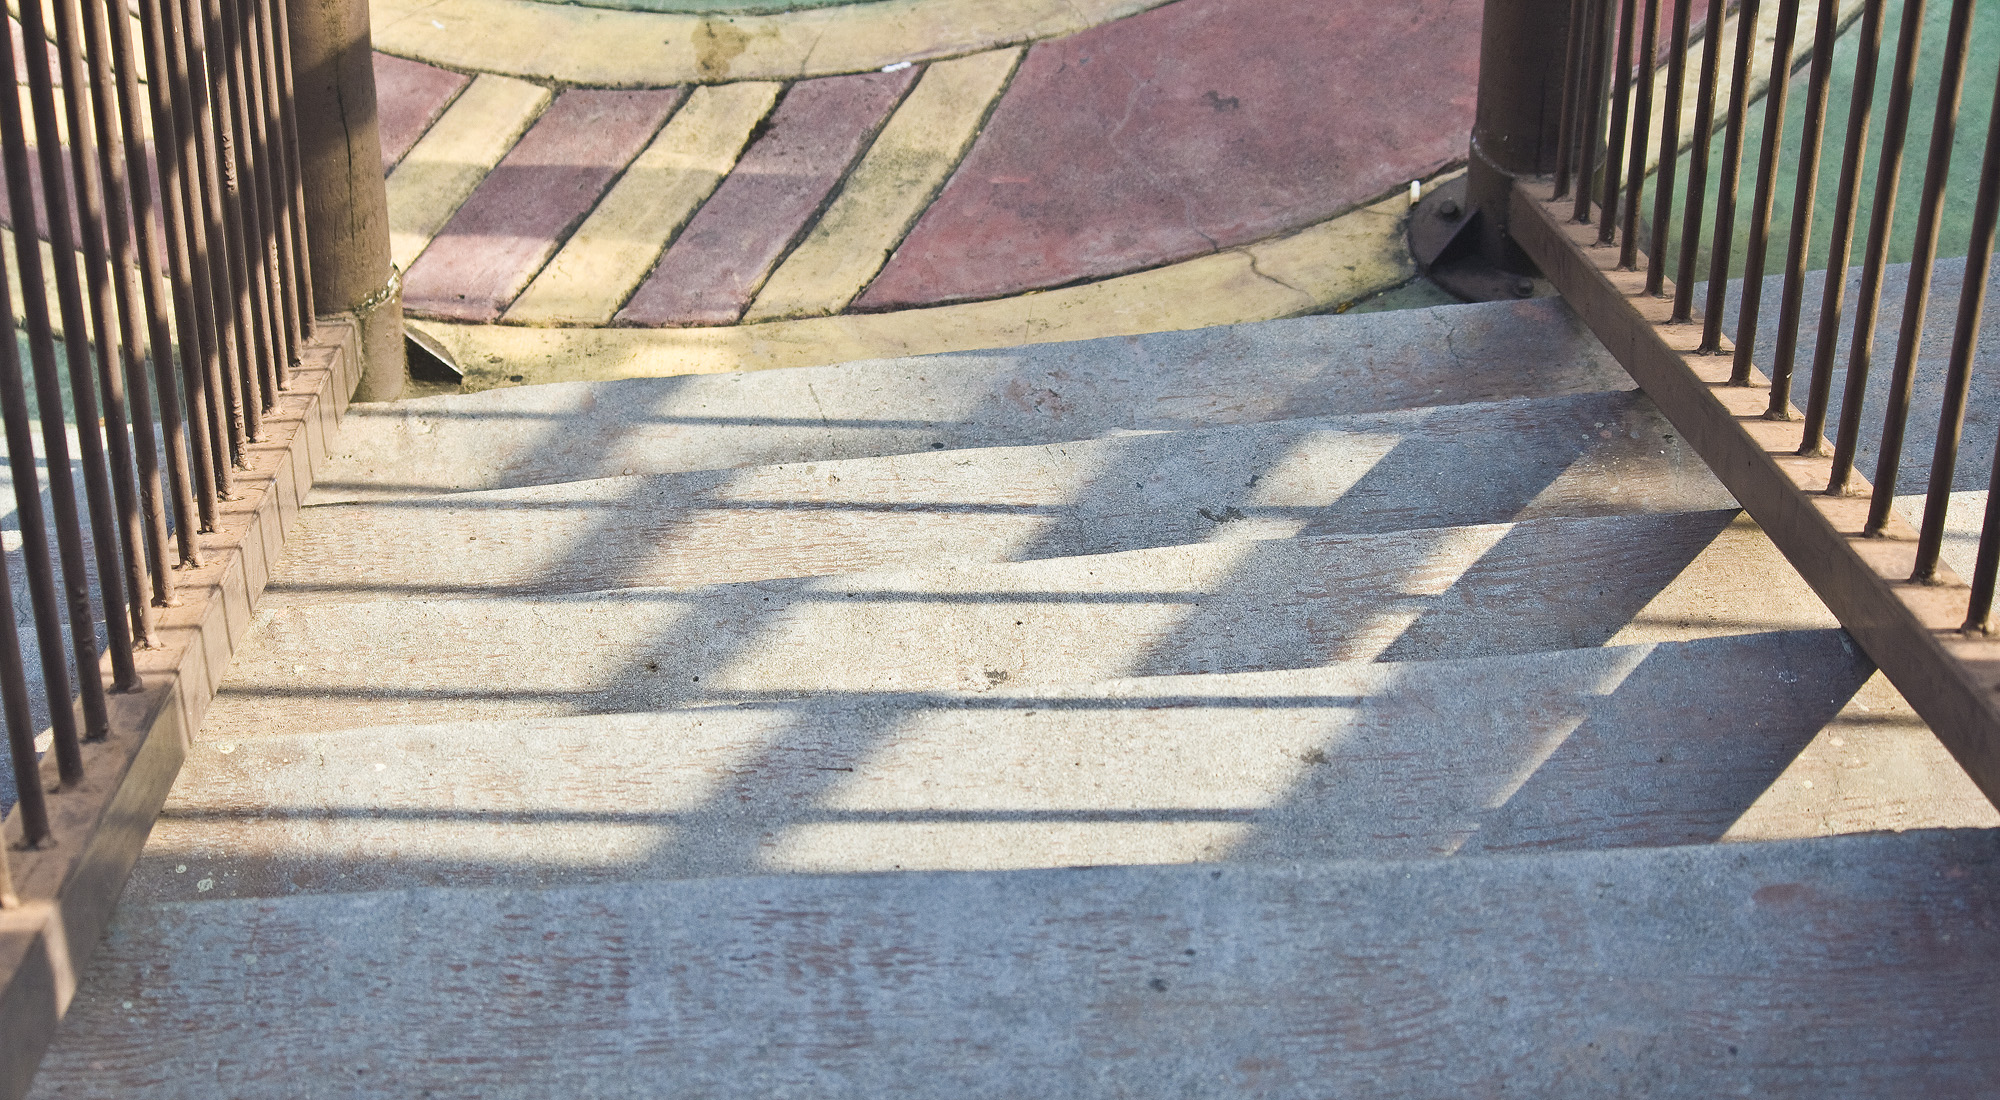 Stairs, Architecture, Nobody, Way, Walk, HQ Photo